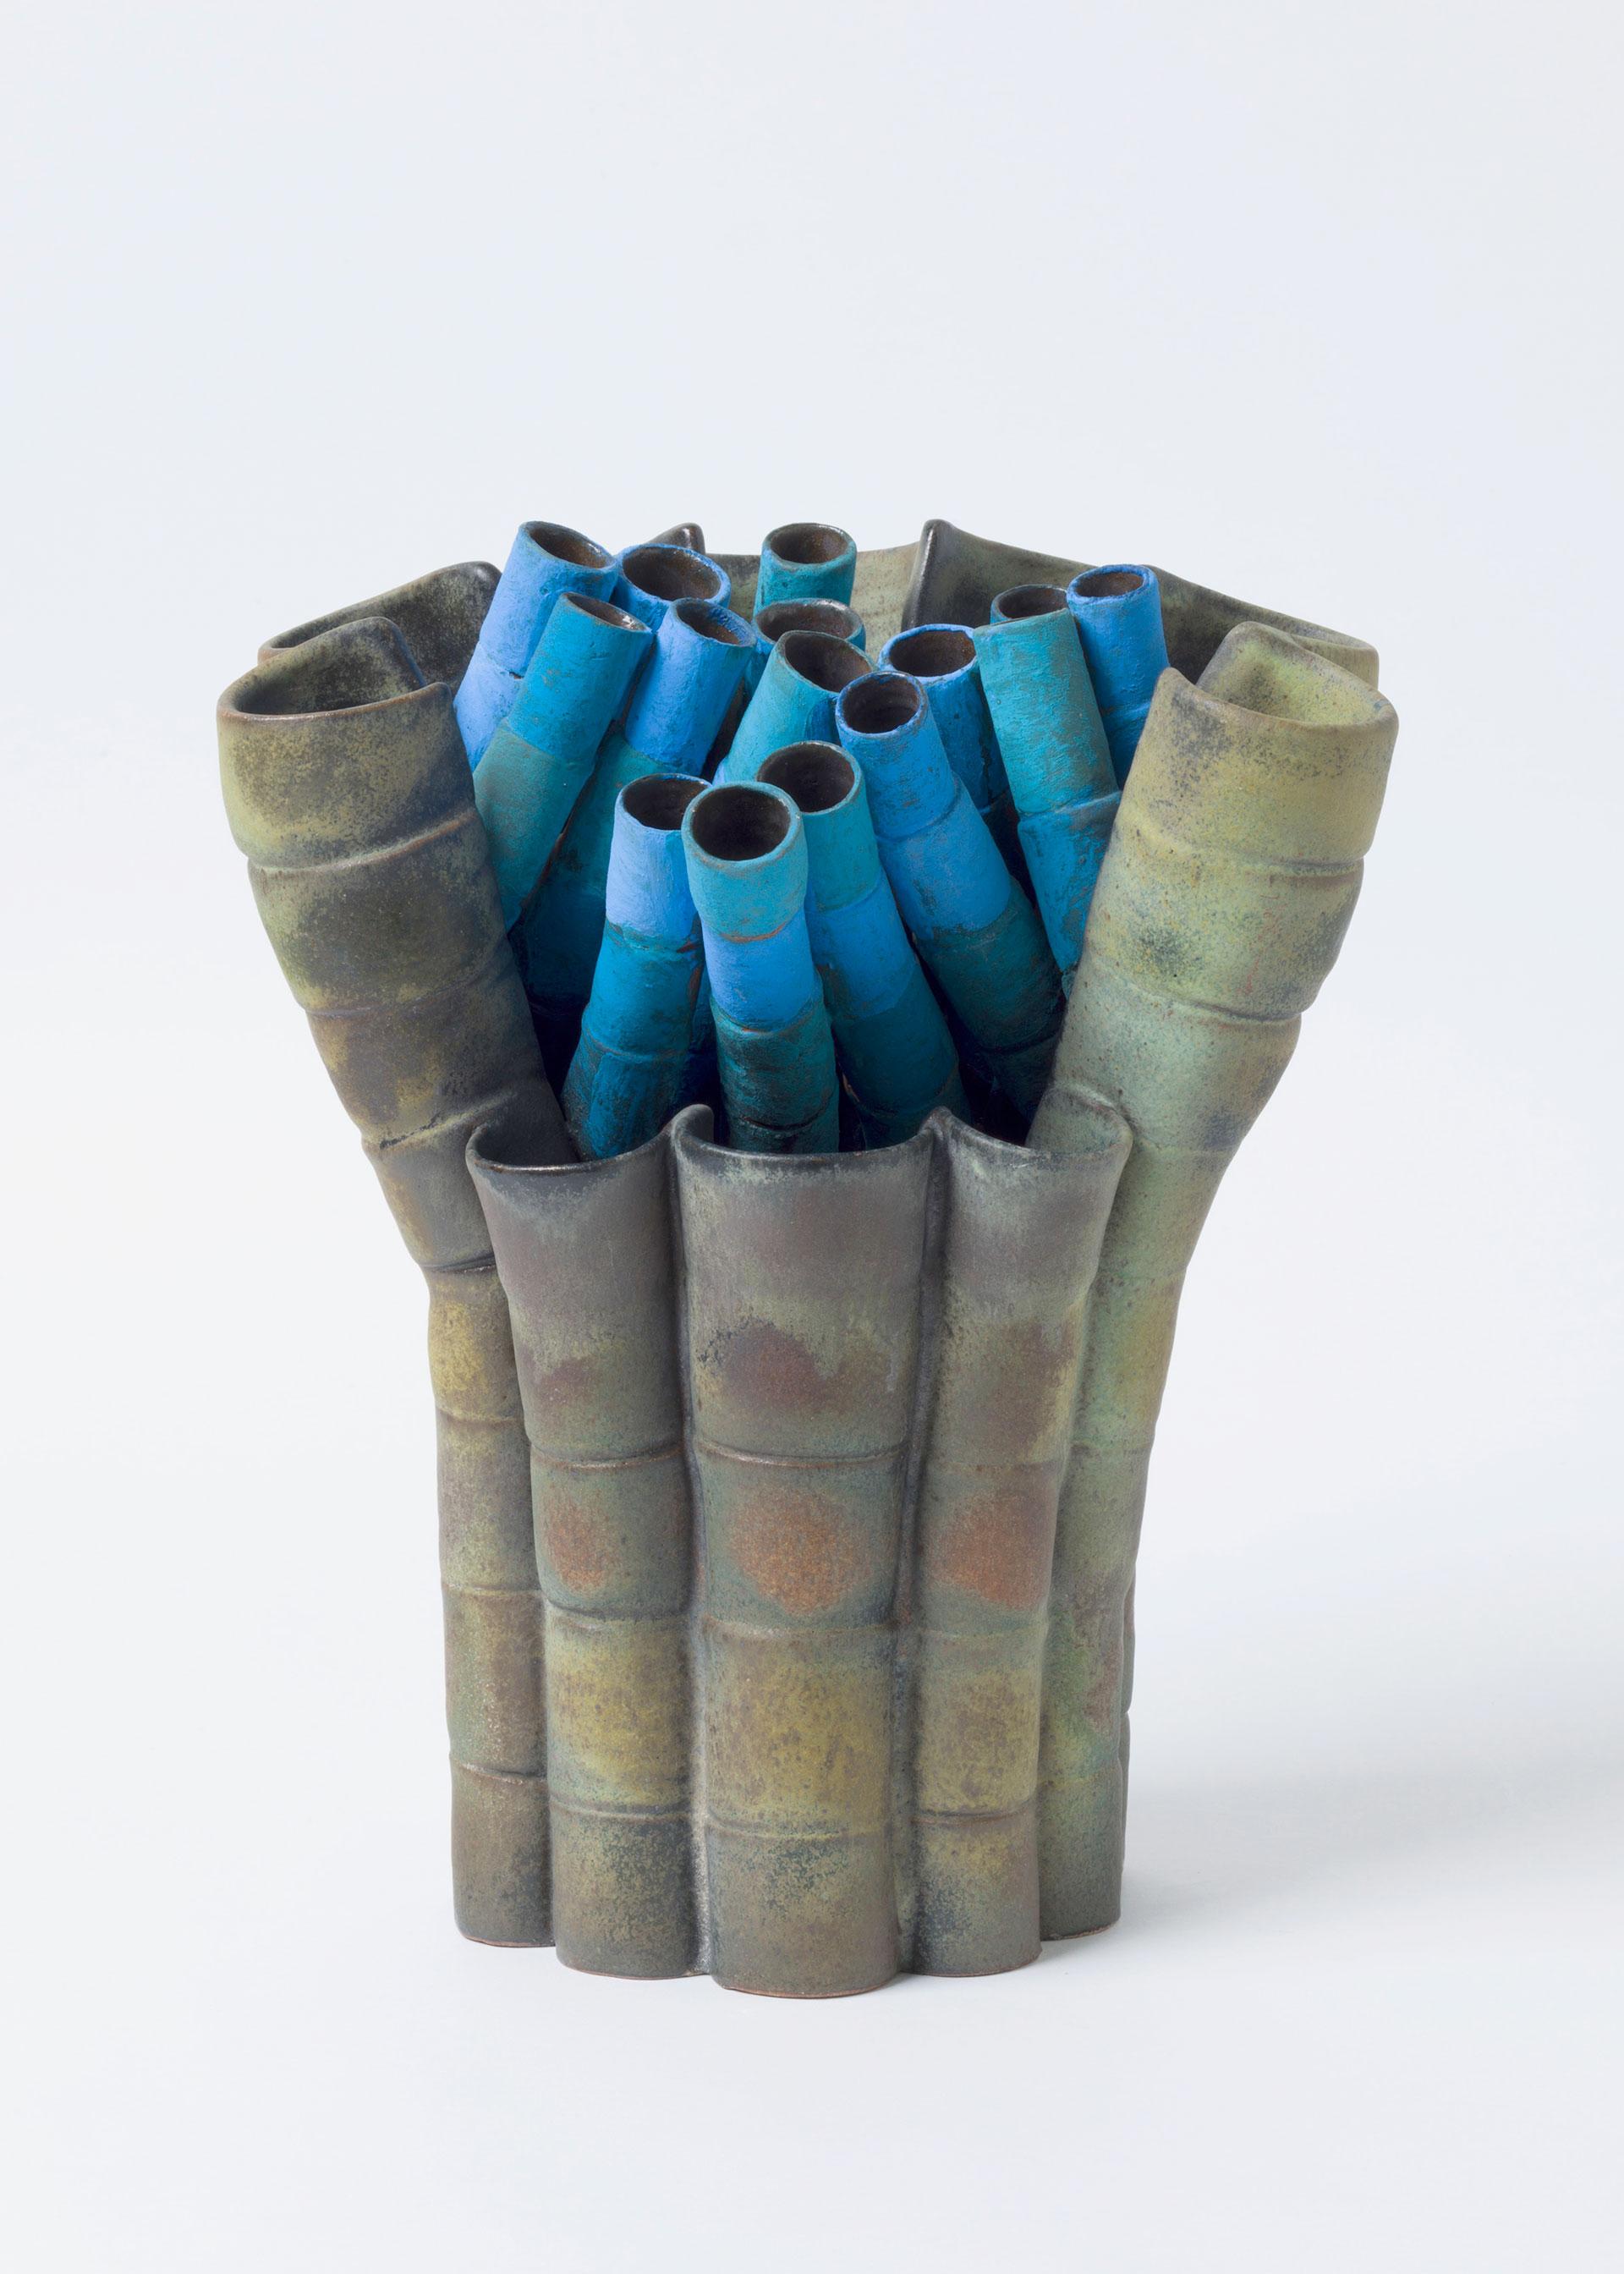 Beate Kuhn, Objekt, Steinzeug, Keramik